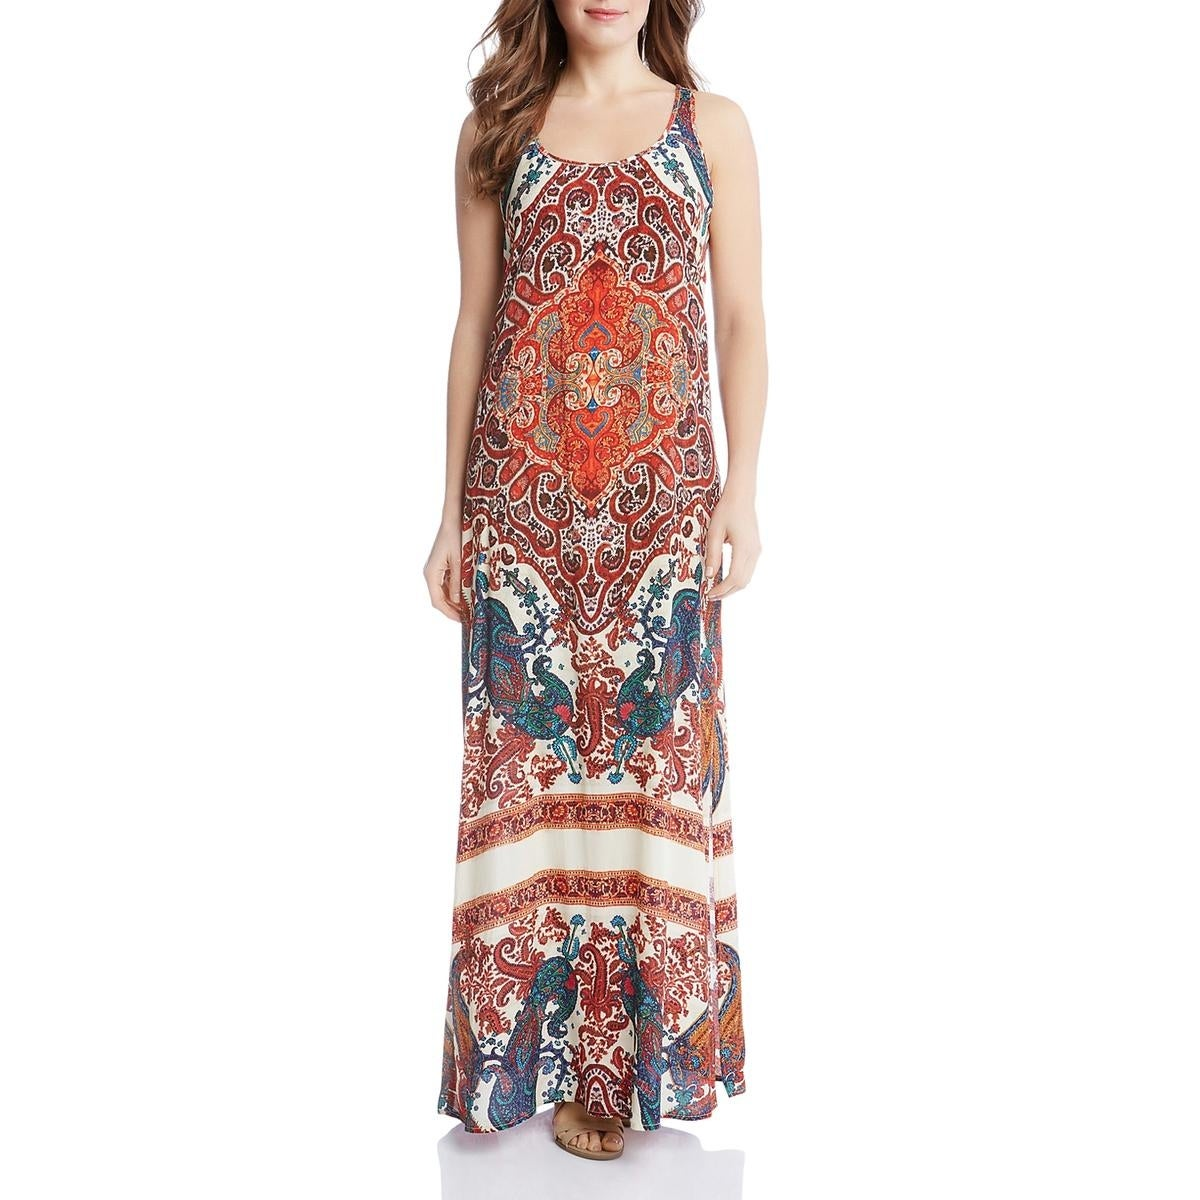 cb7bfb30c22 Shop Karen Kane Womens Maxi Dress Printed Side Slit - On Sale - Free  Shipping Today - Overstock - 23528002